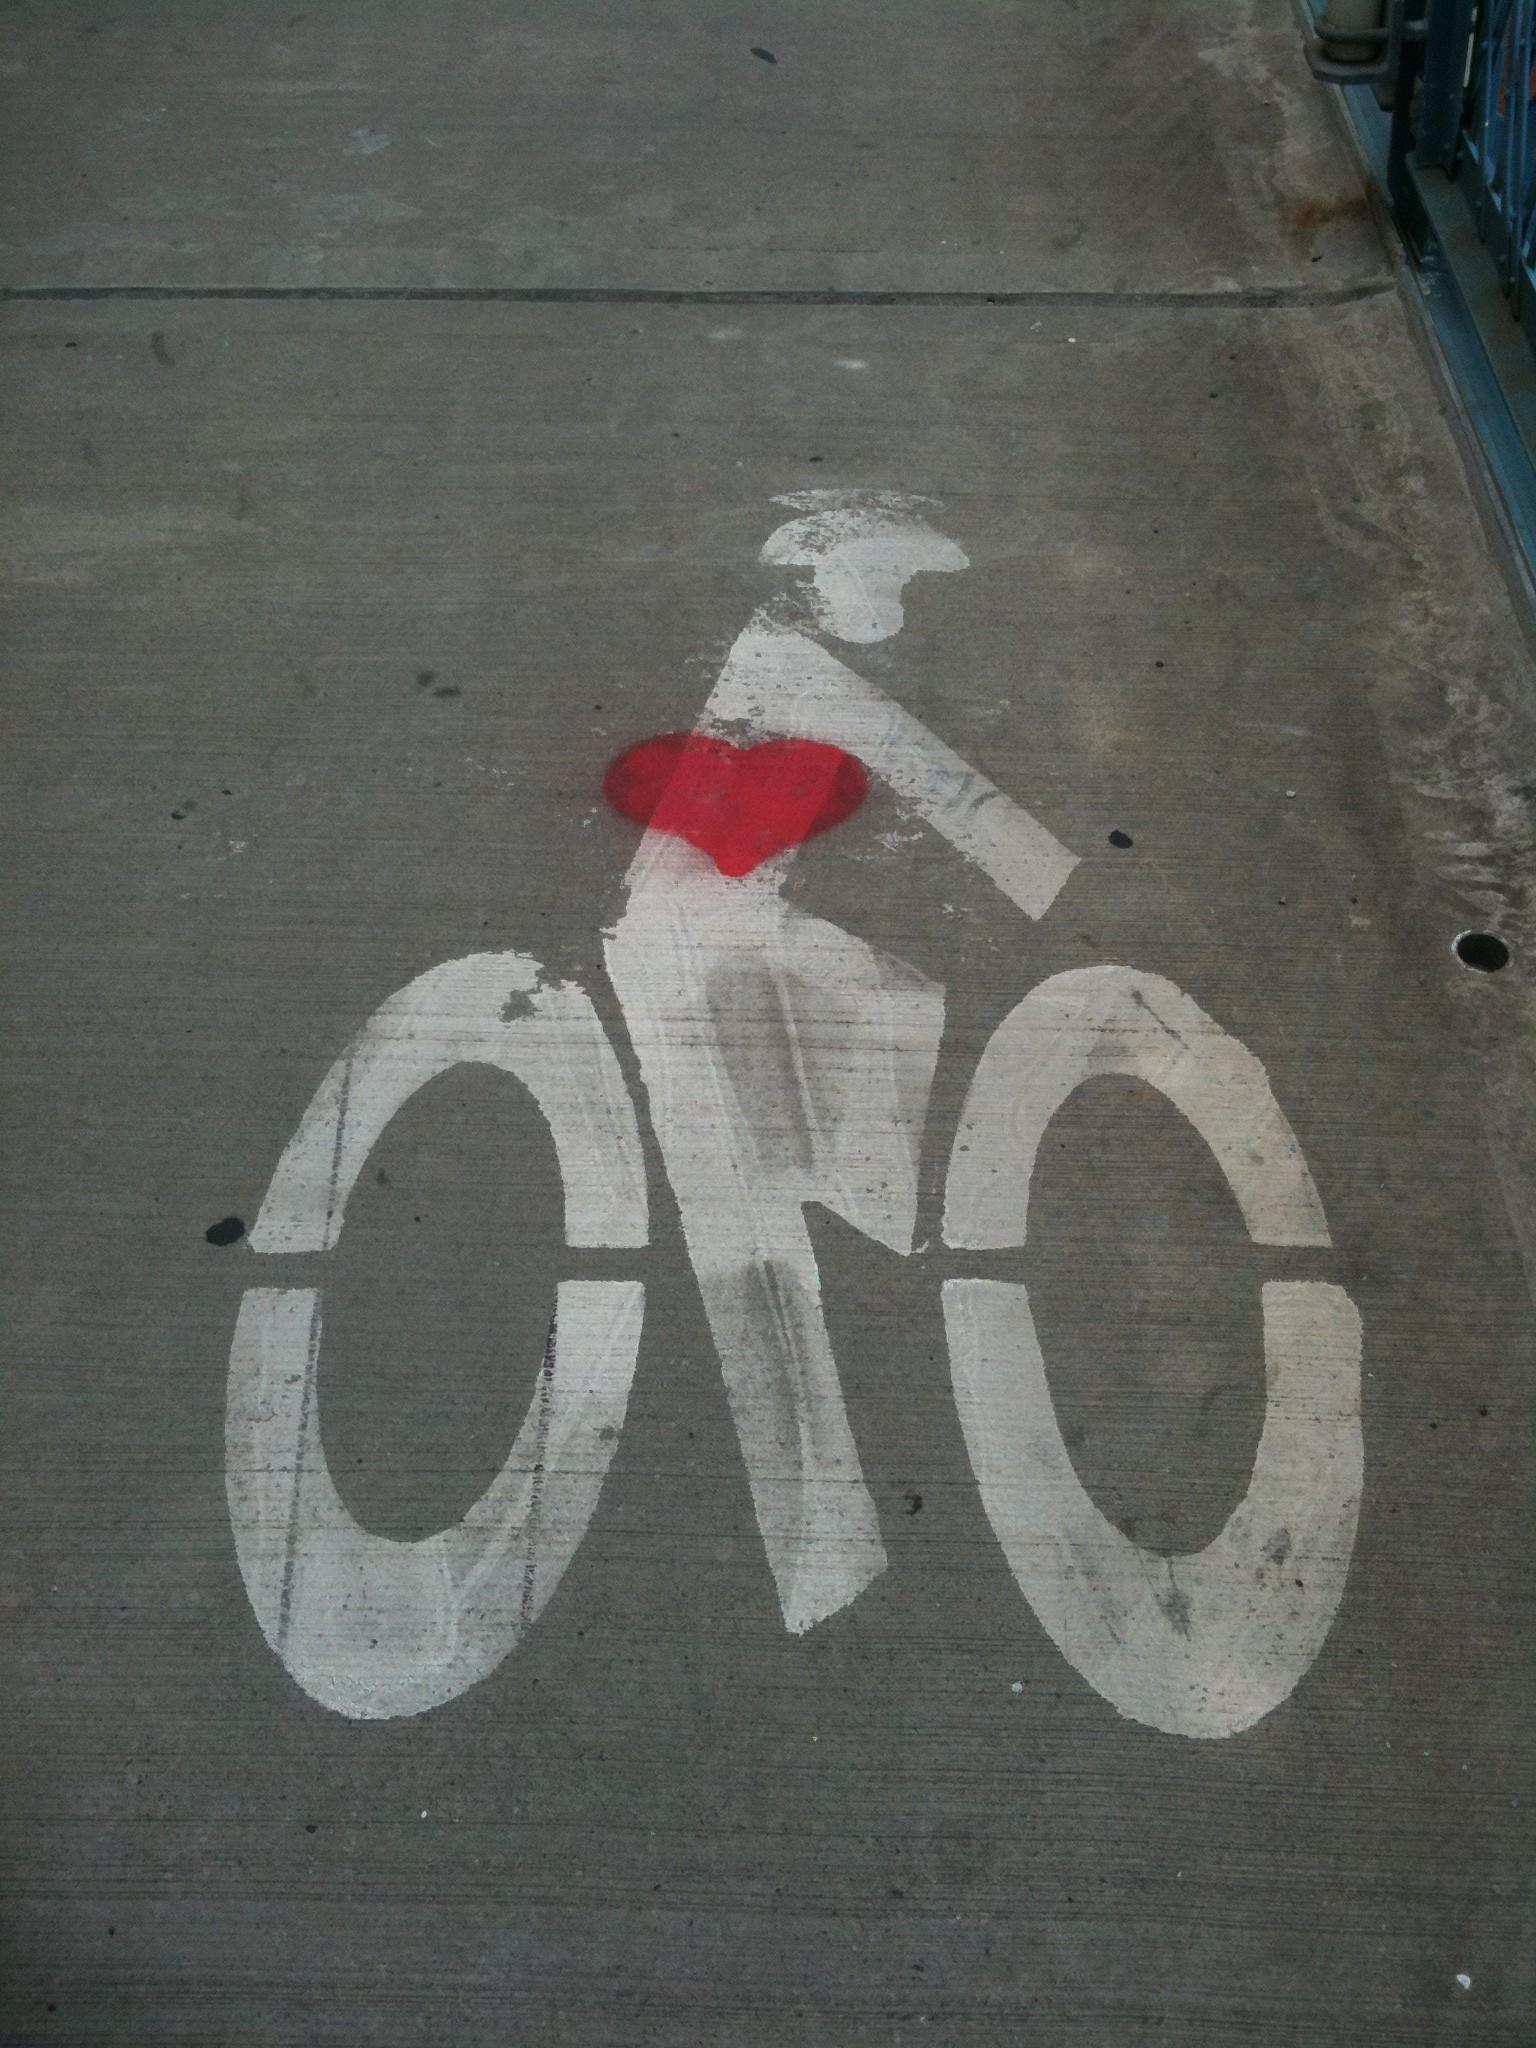 bikelanelove